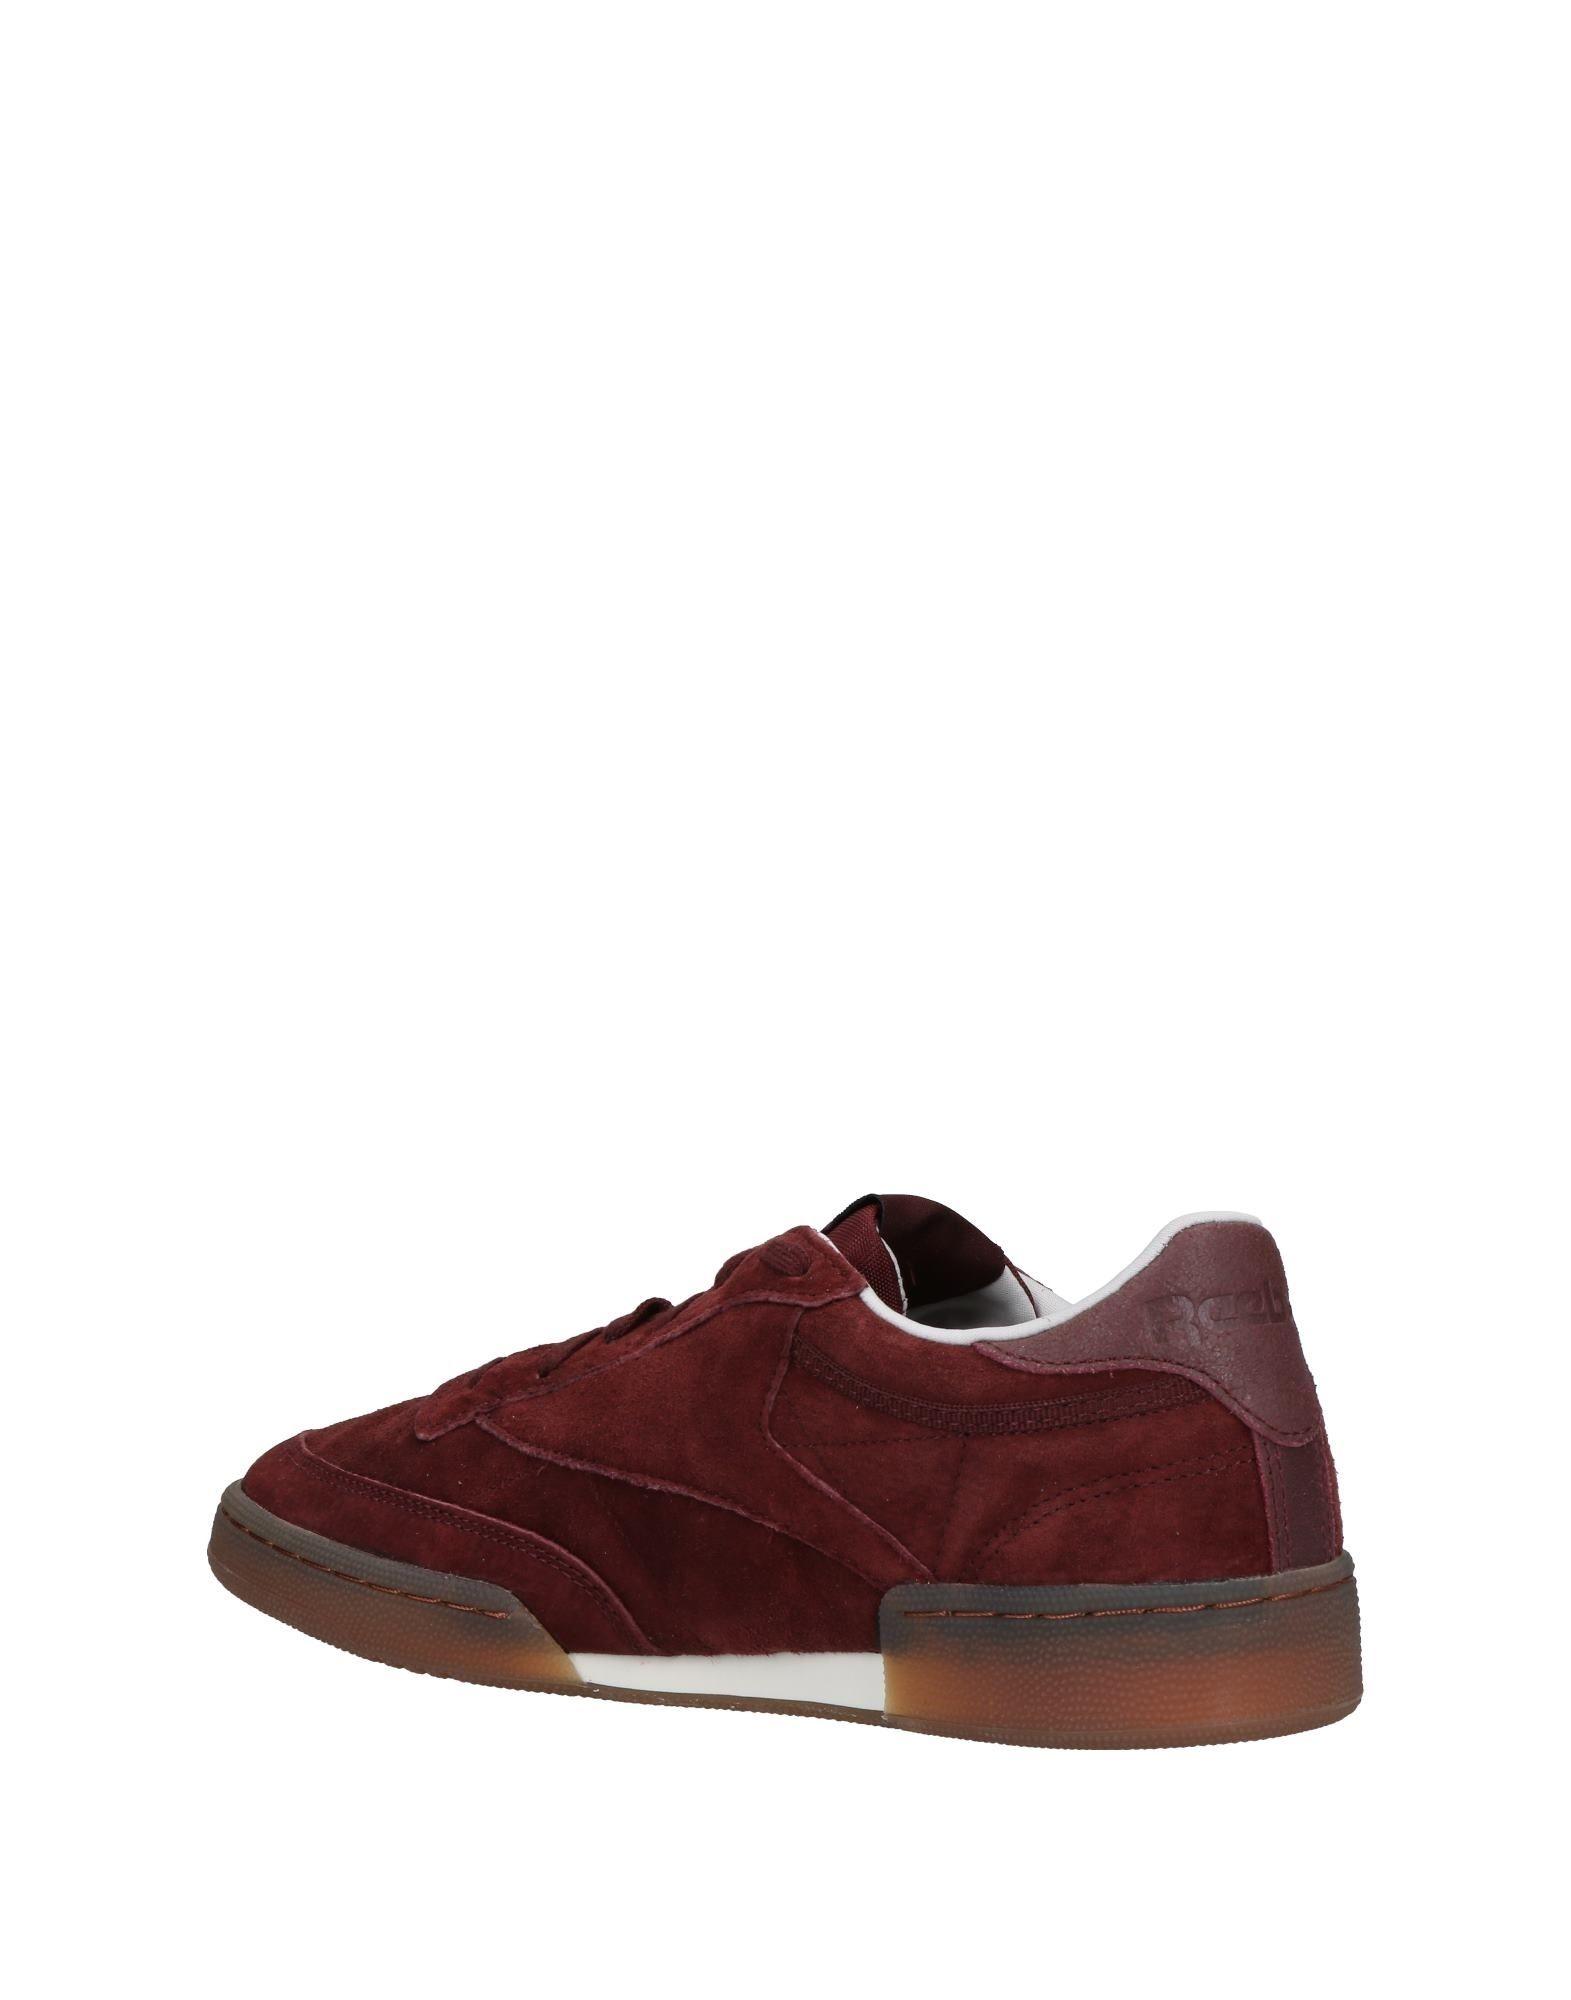 Rabatt echte  Schuhe Reebok Sneakers Herren  echte 11501129SF 5364e8